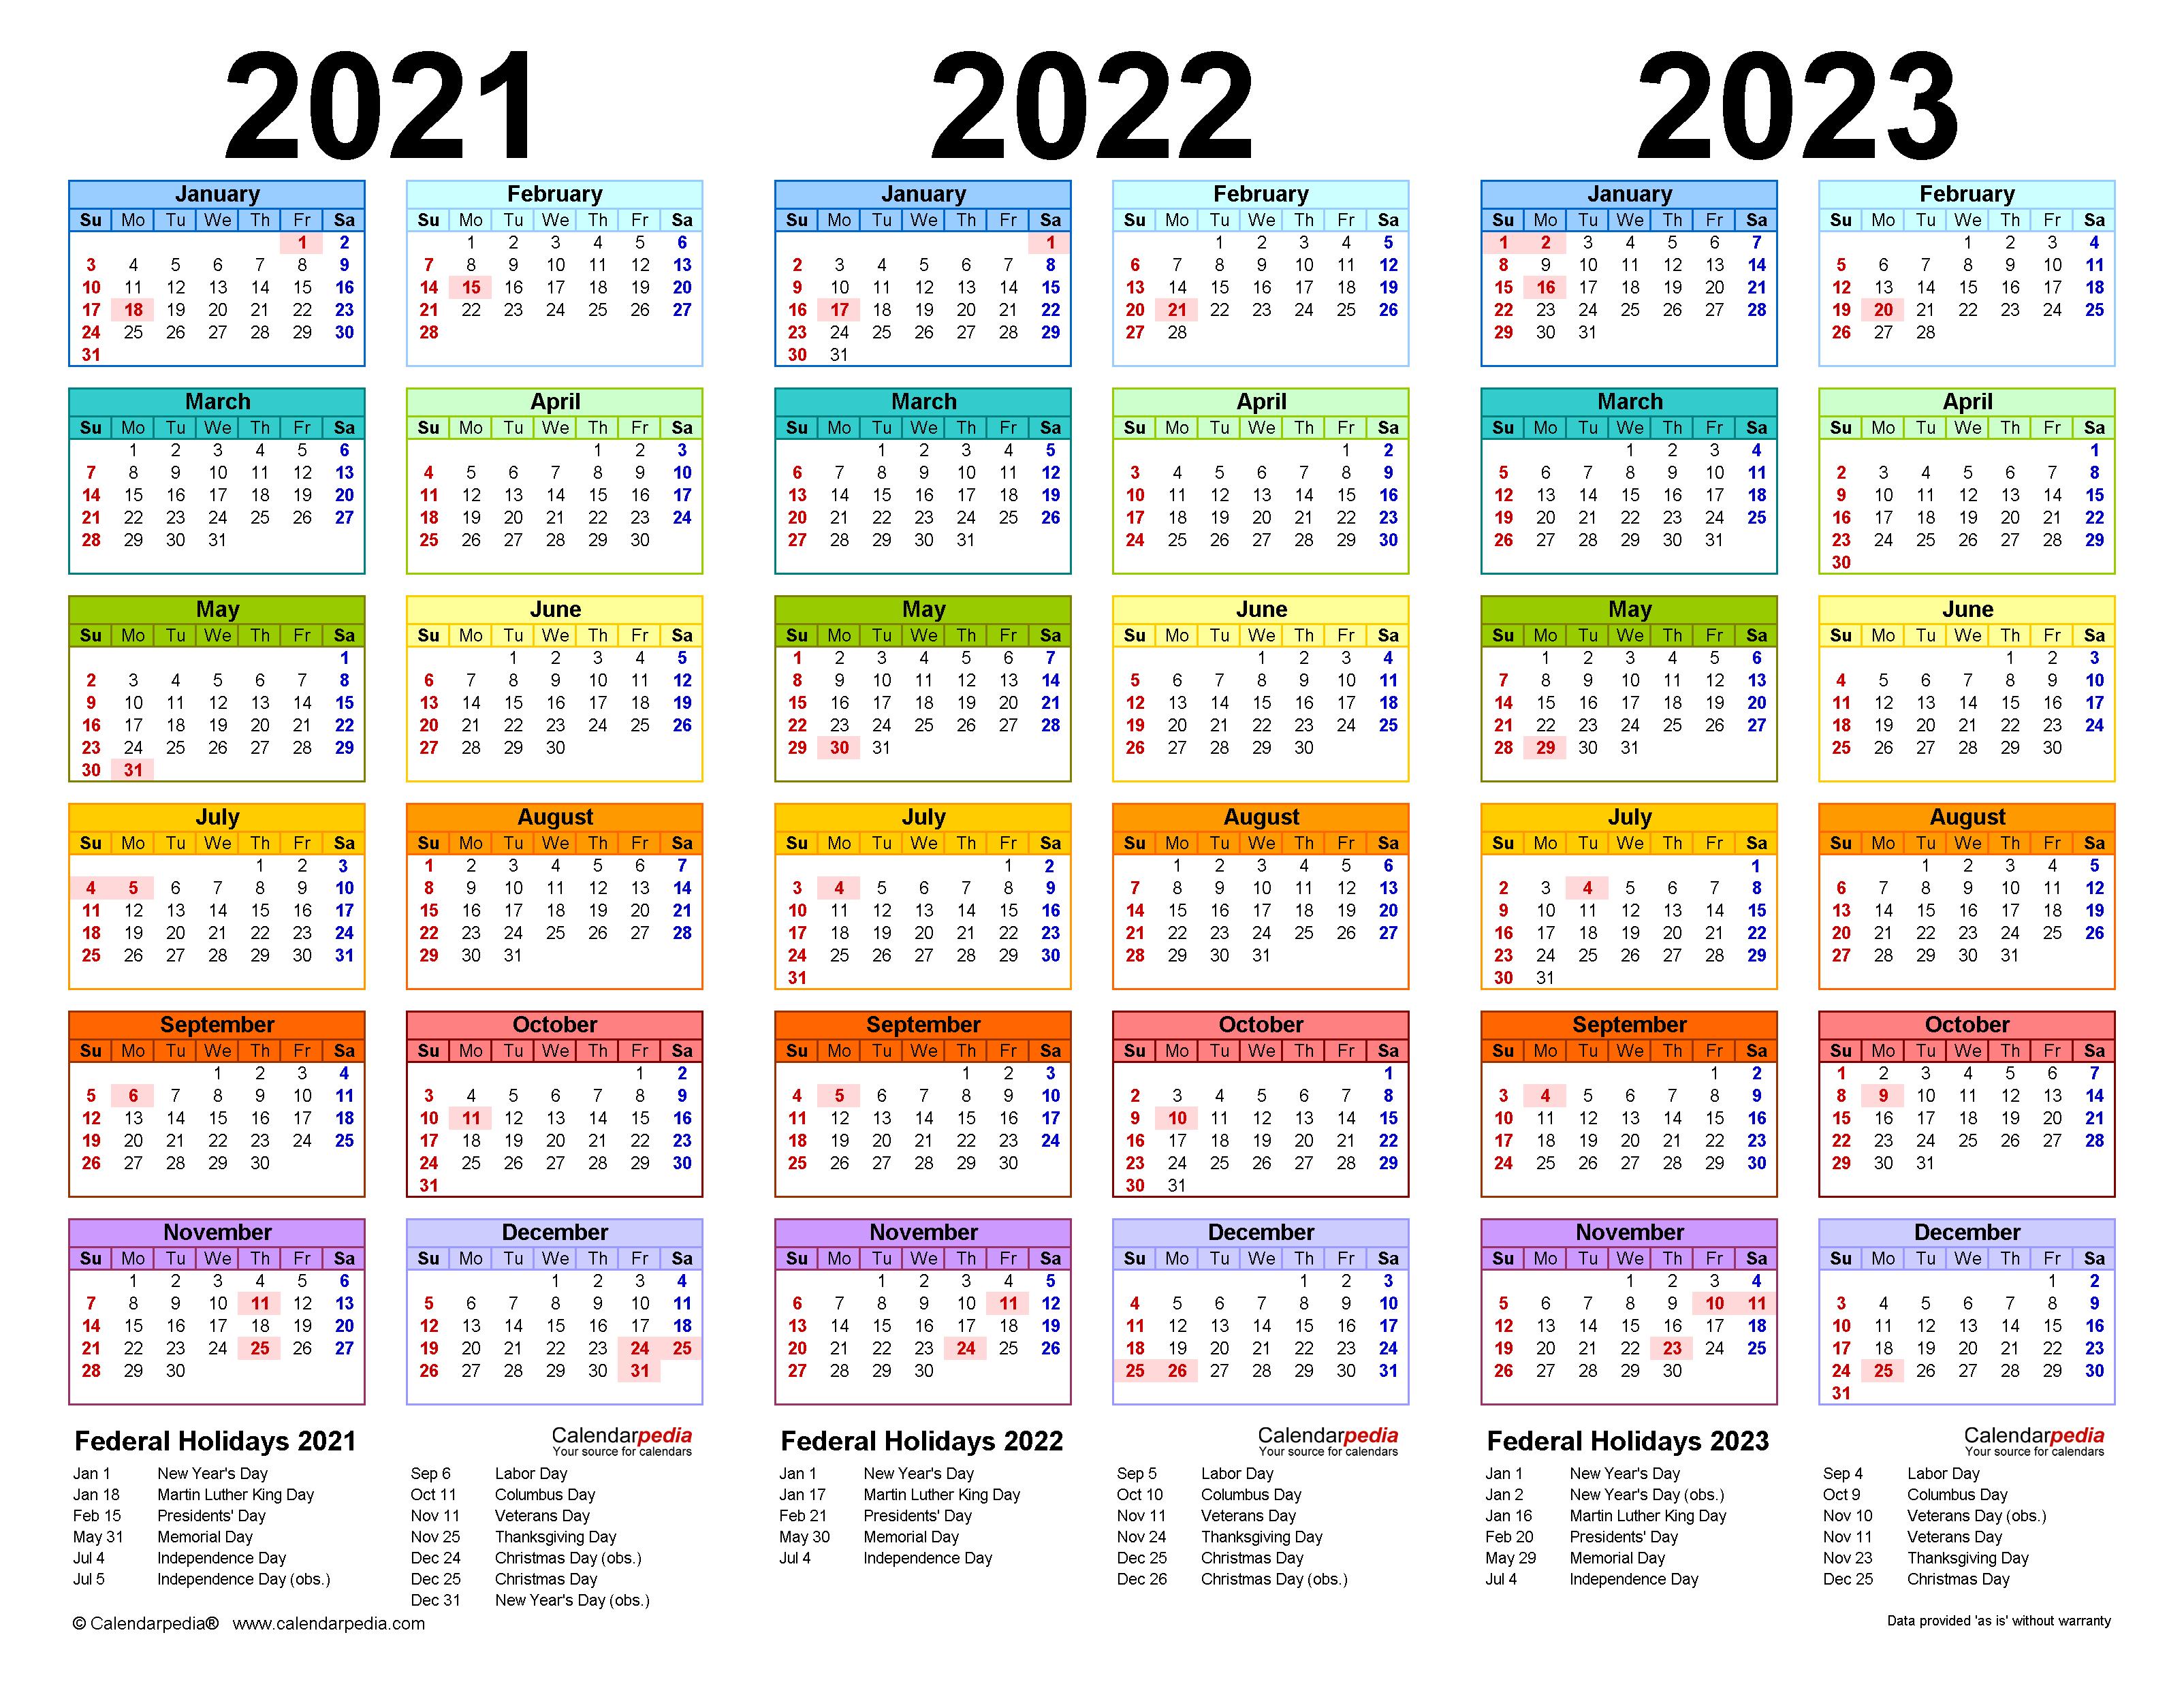 Wcpss Calendar 2021 22 Year Round | 2021 Calendar within Boise State University Calendar 2021